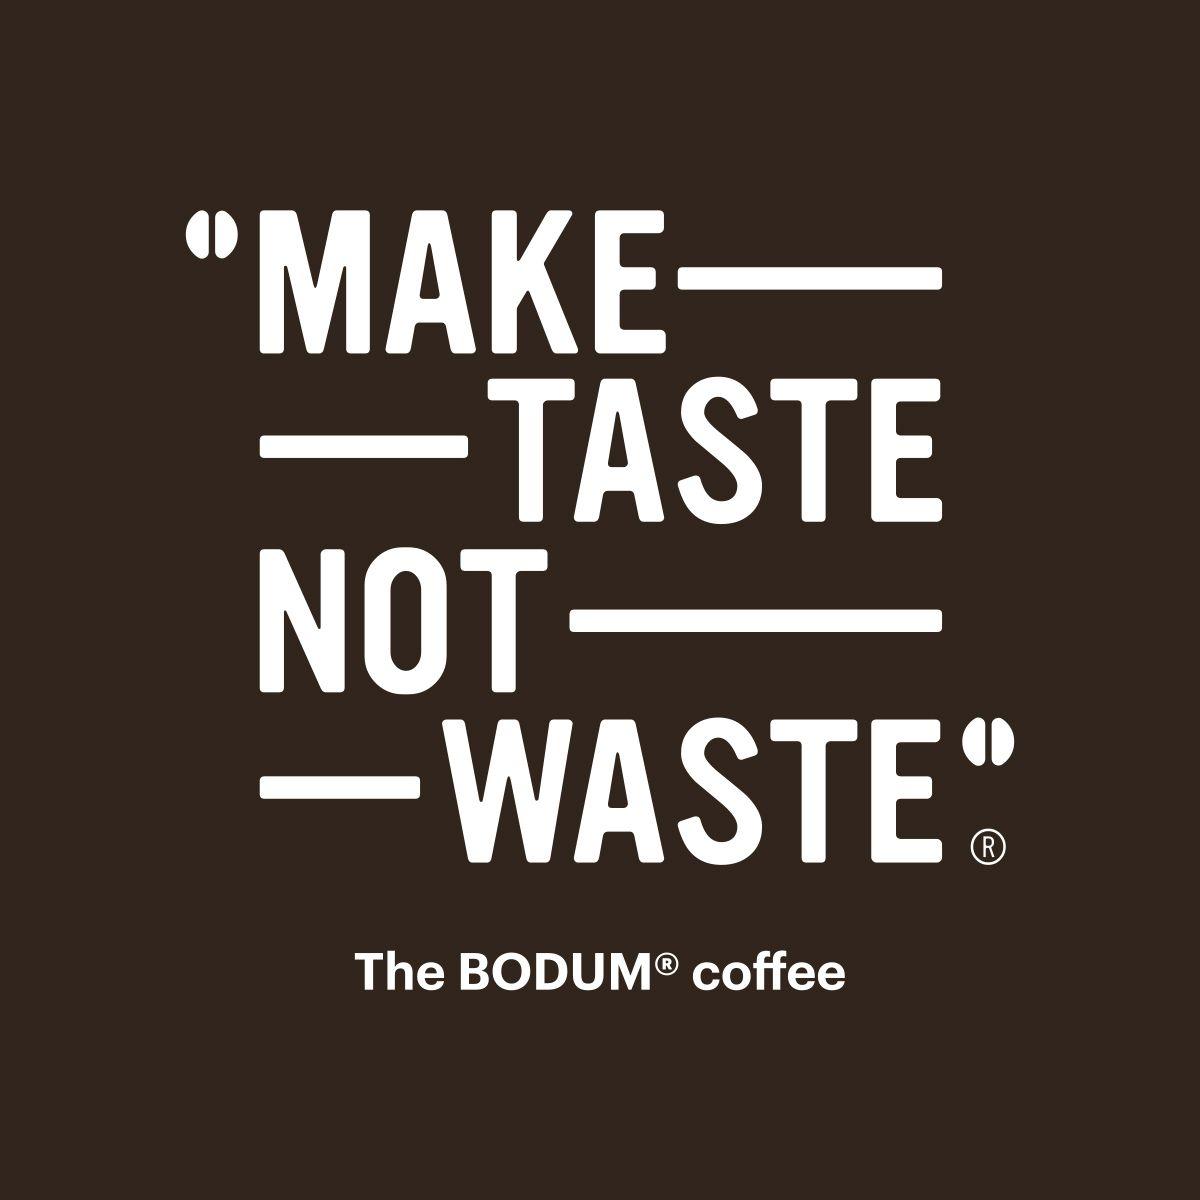 Make Taste Not Waste BODUM COFFEE Bodum